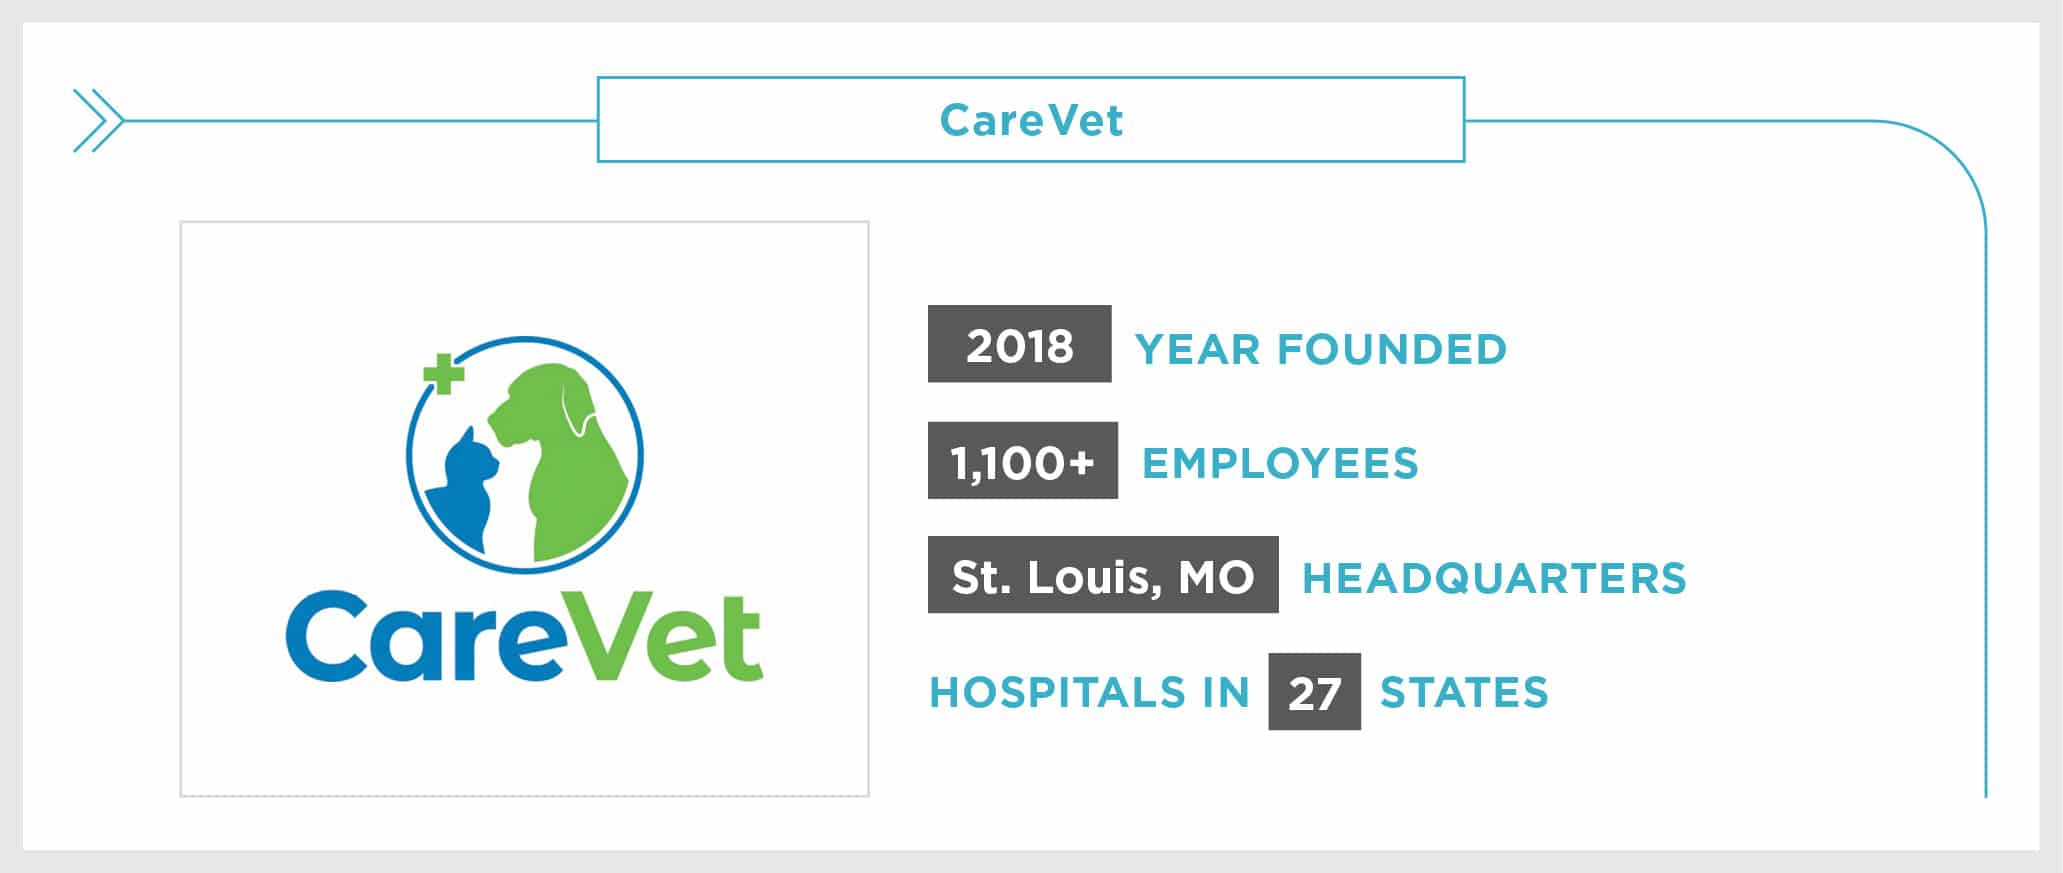 Vision Statement: CareVet